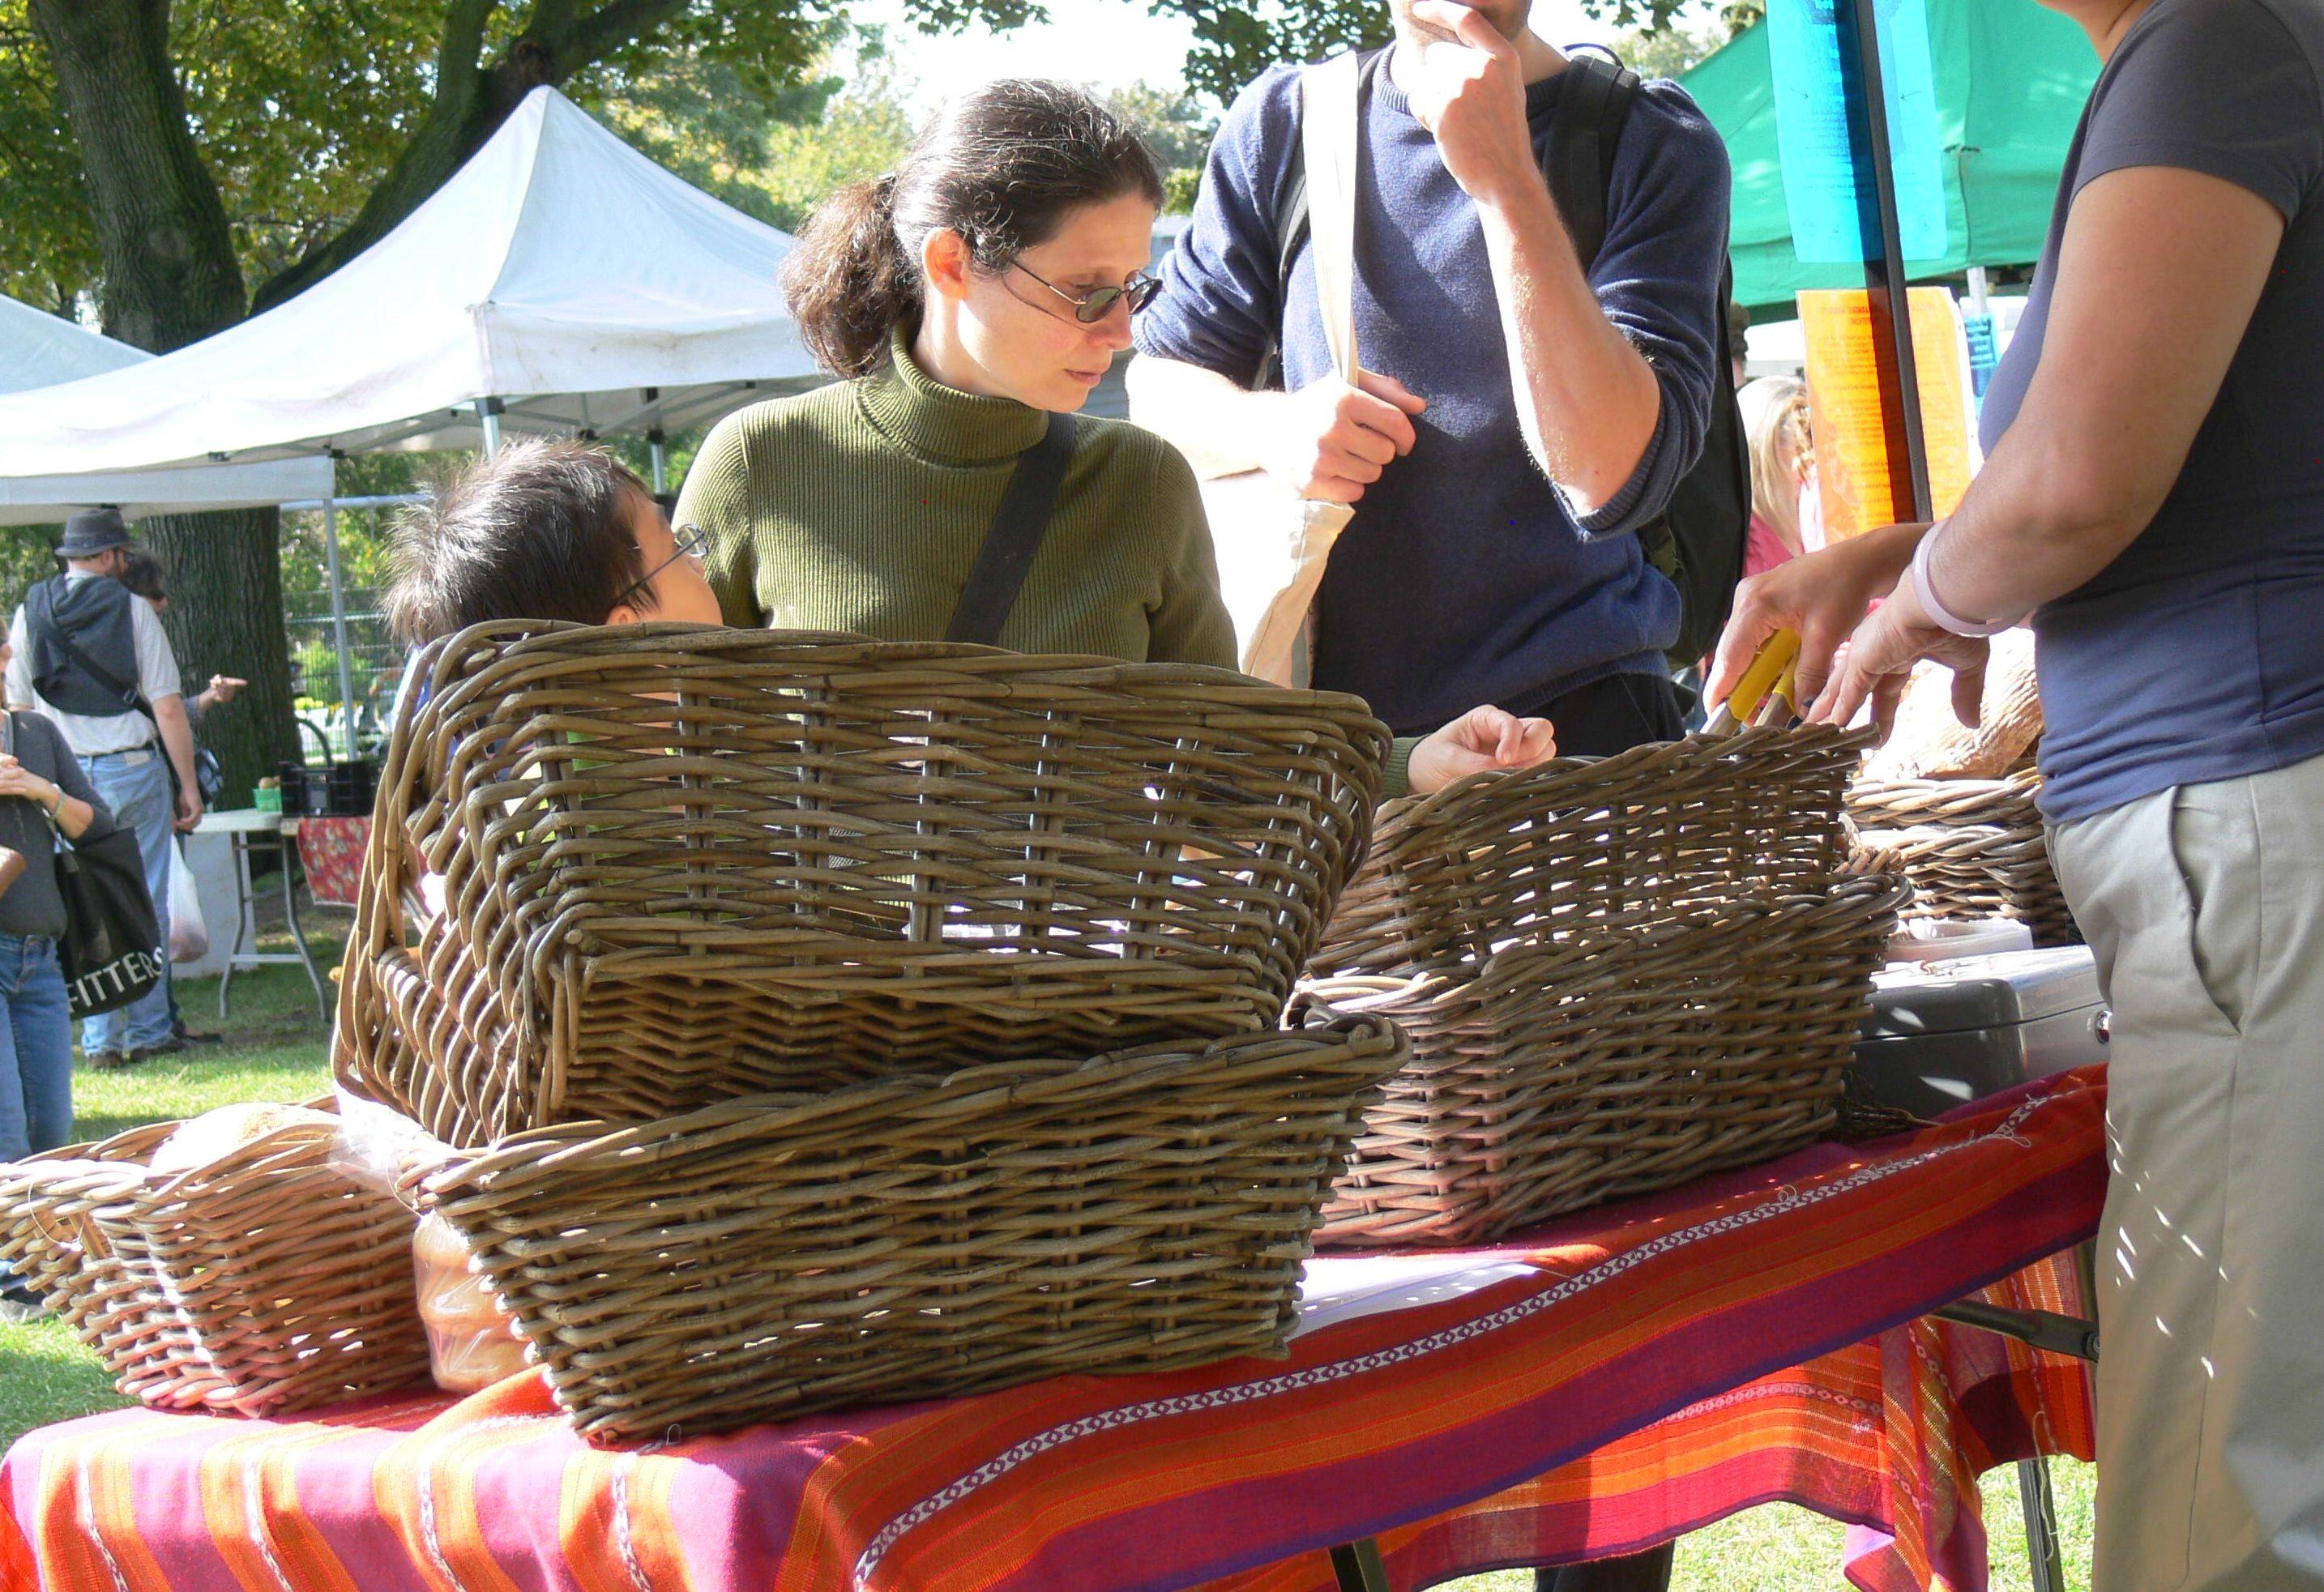 Adriana Mugnatto-Hamu at Withrow Park farmers' market